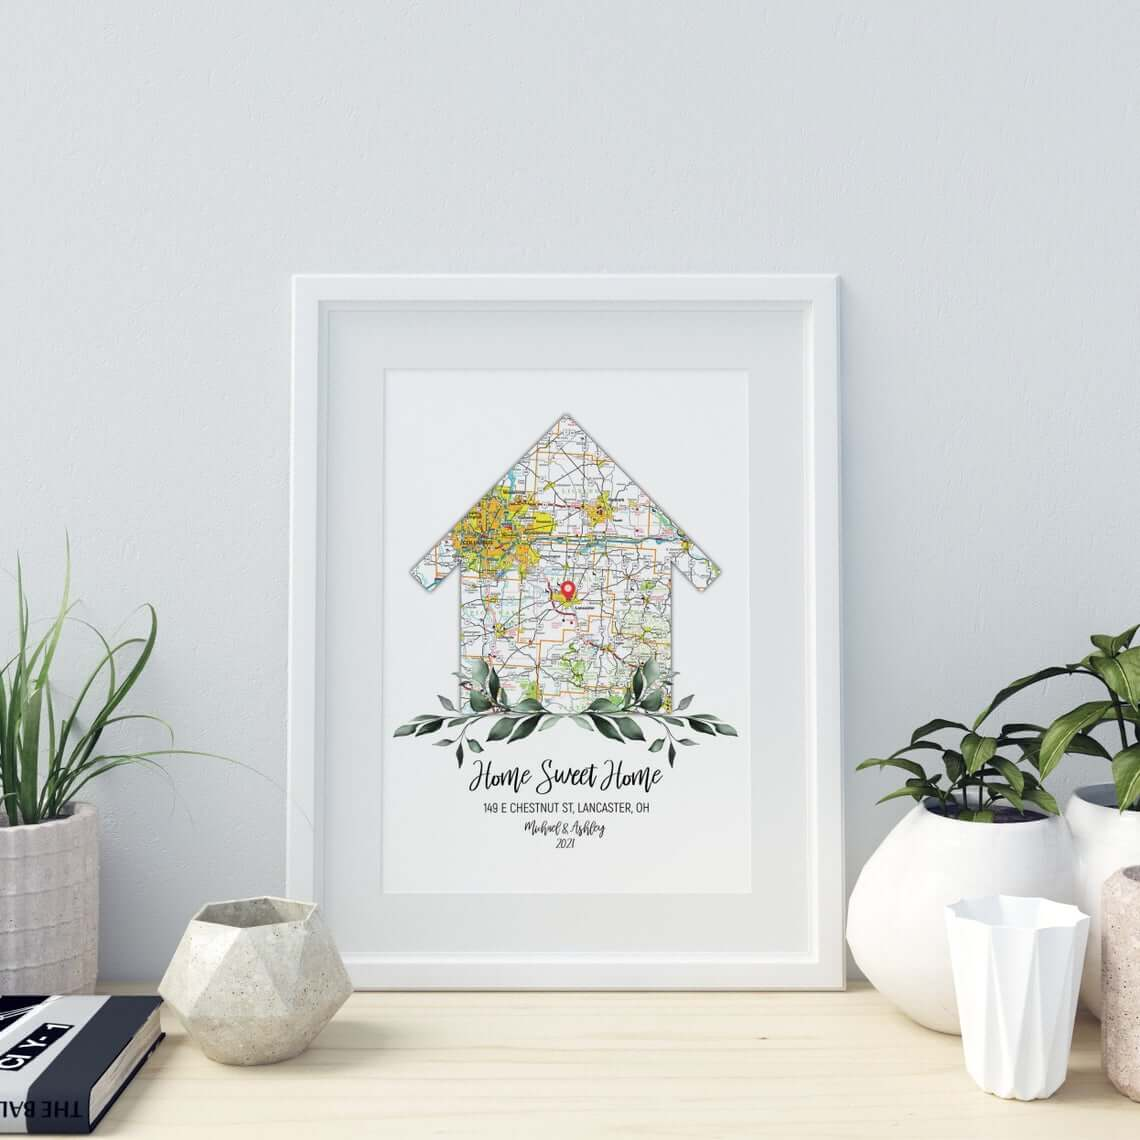 Digital New Home Neighborhood Map Print